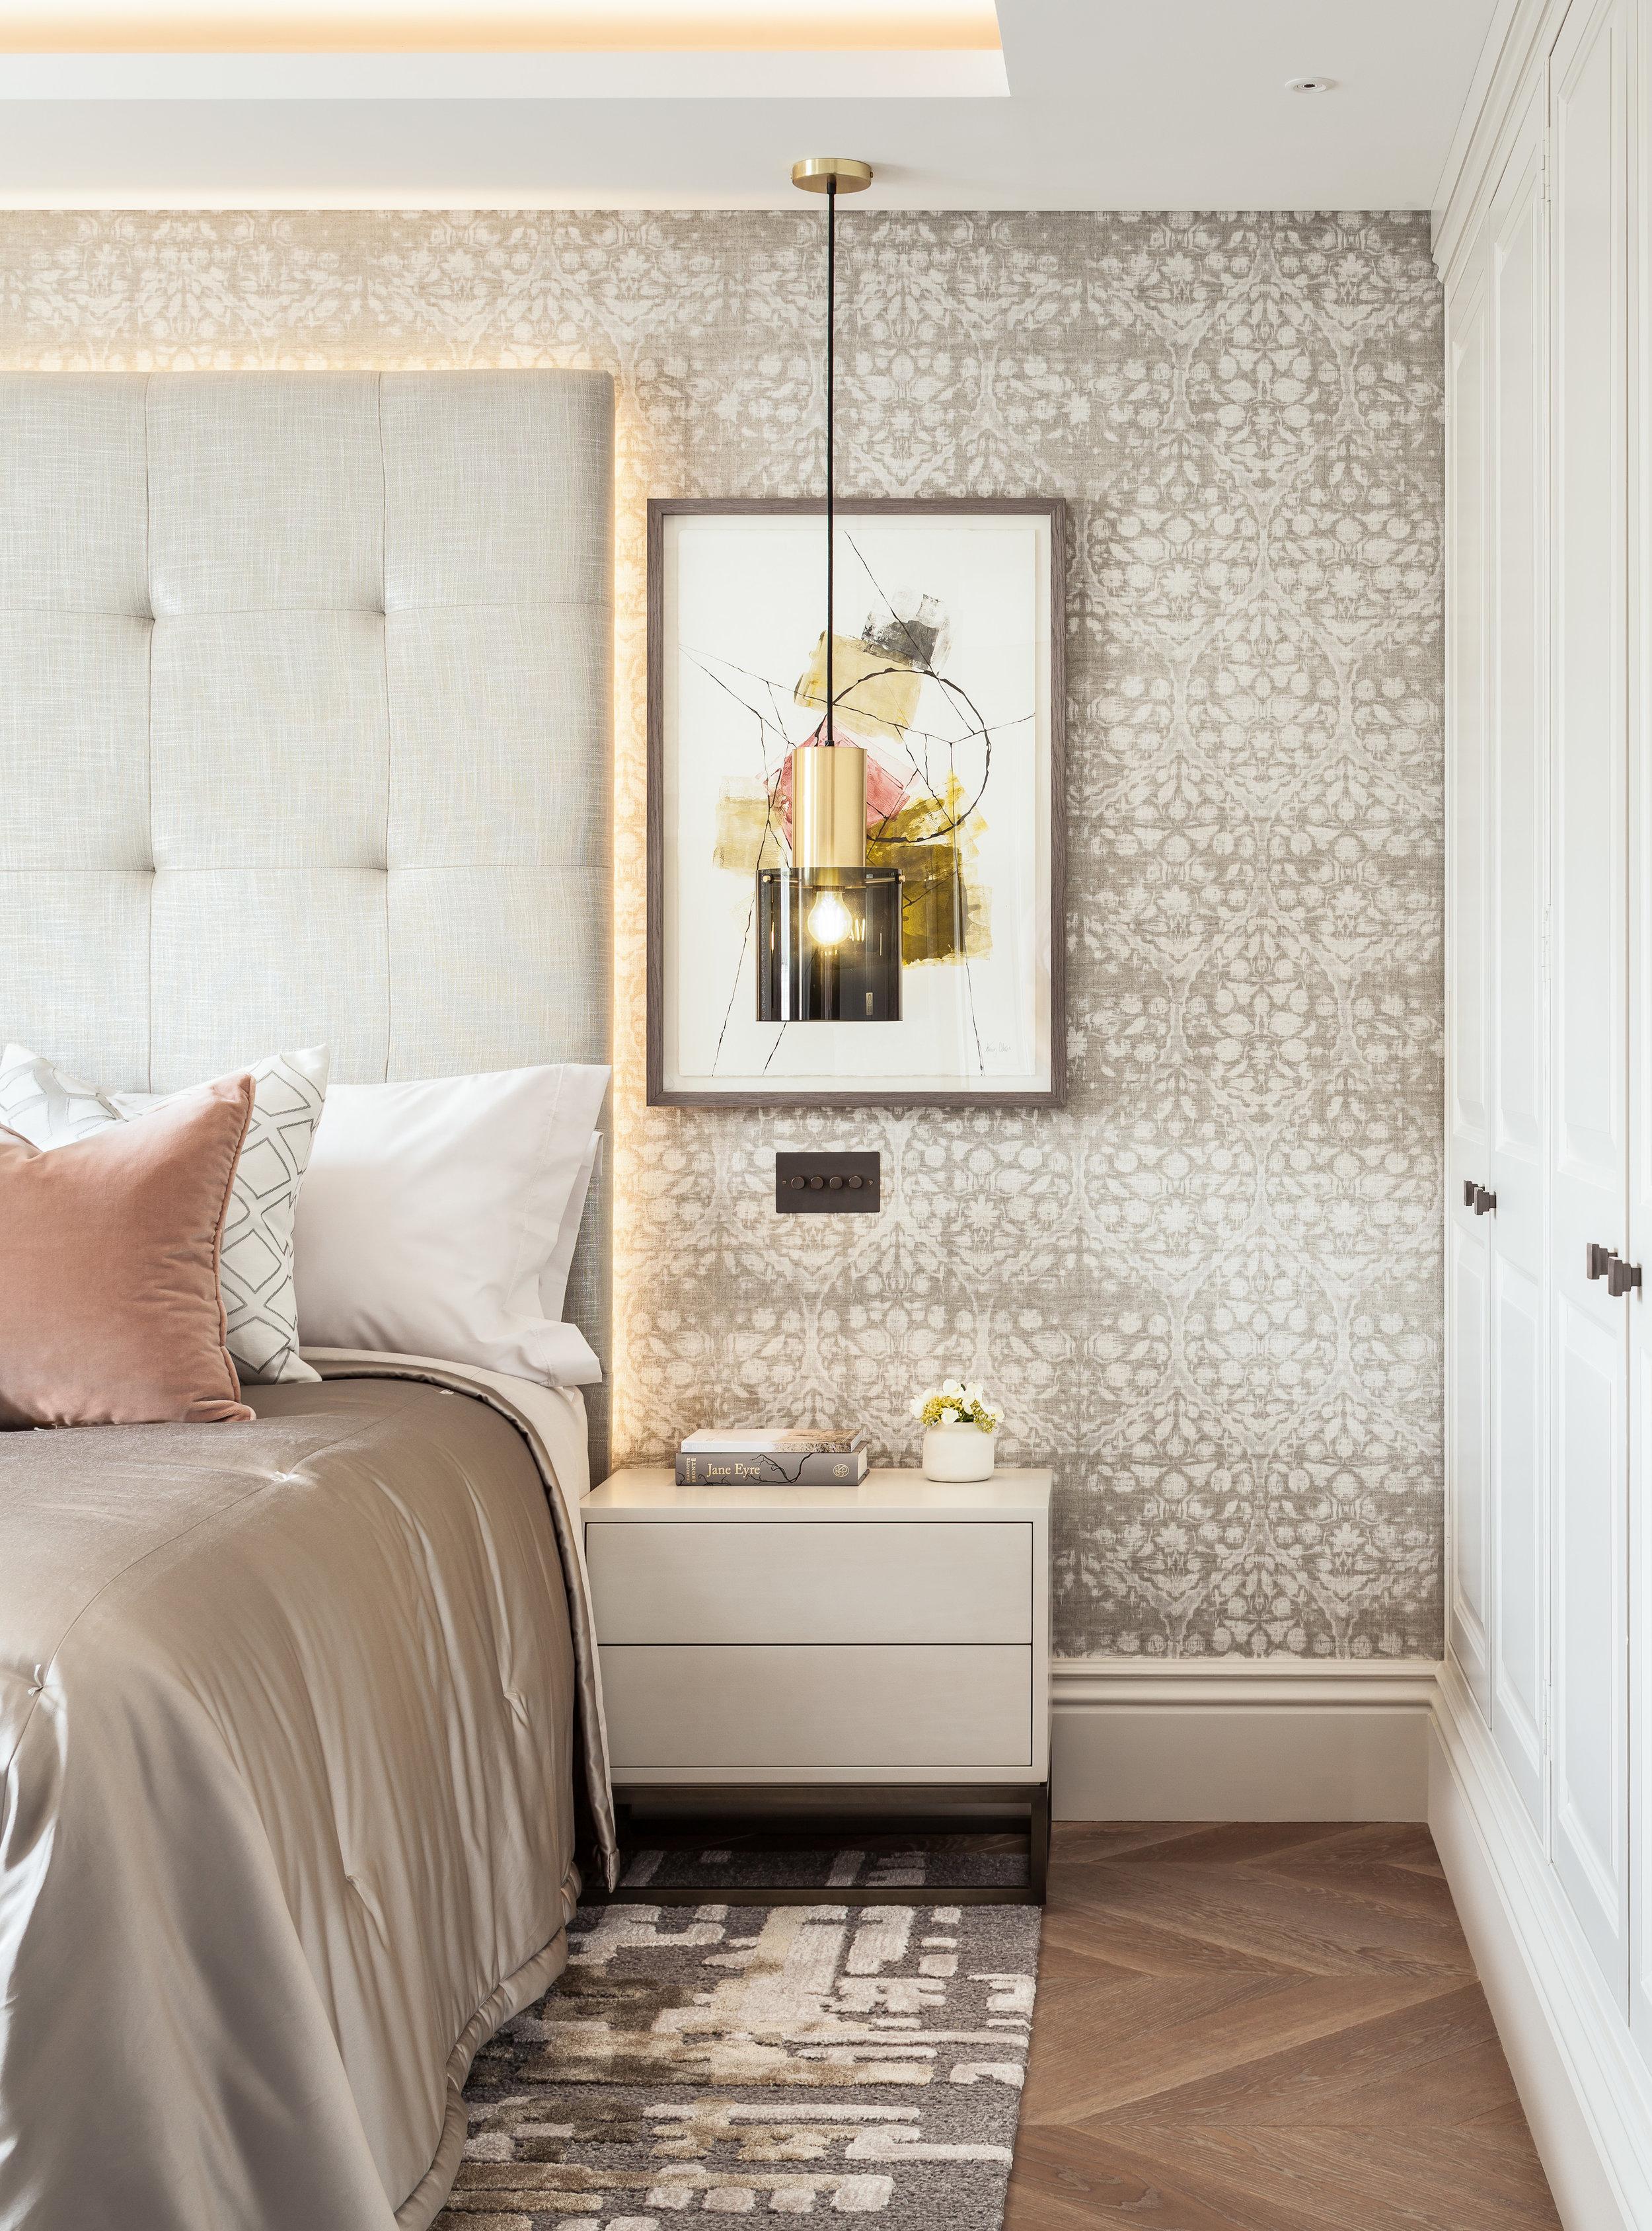 Jo Hamilton Interiors - Kensington bedroom sidetable